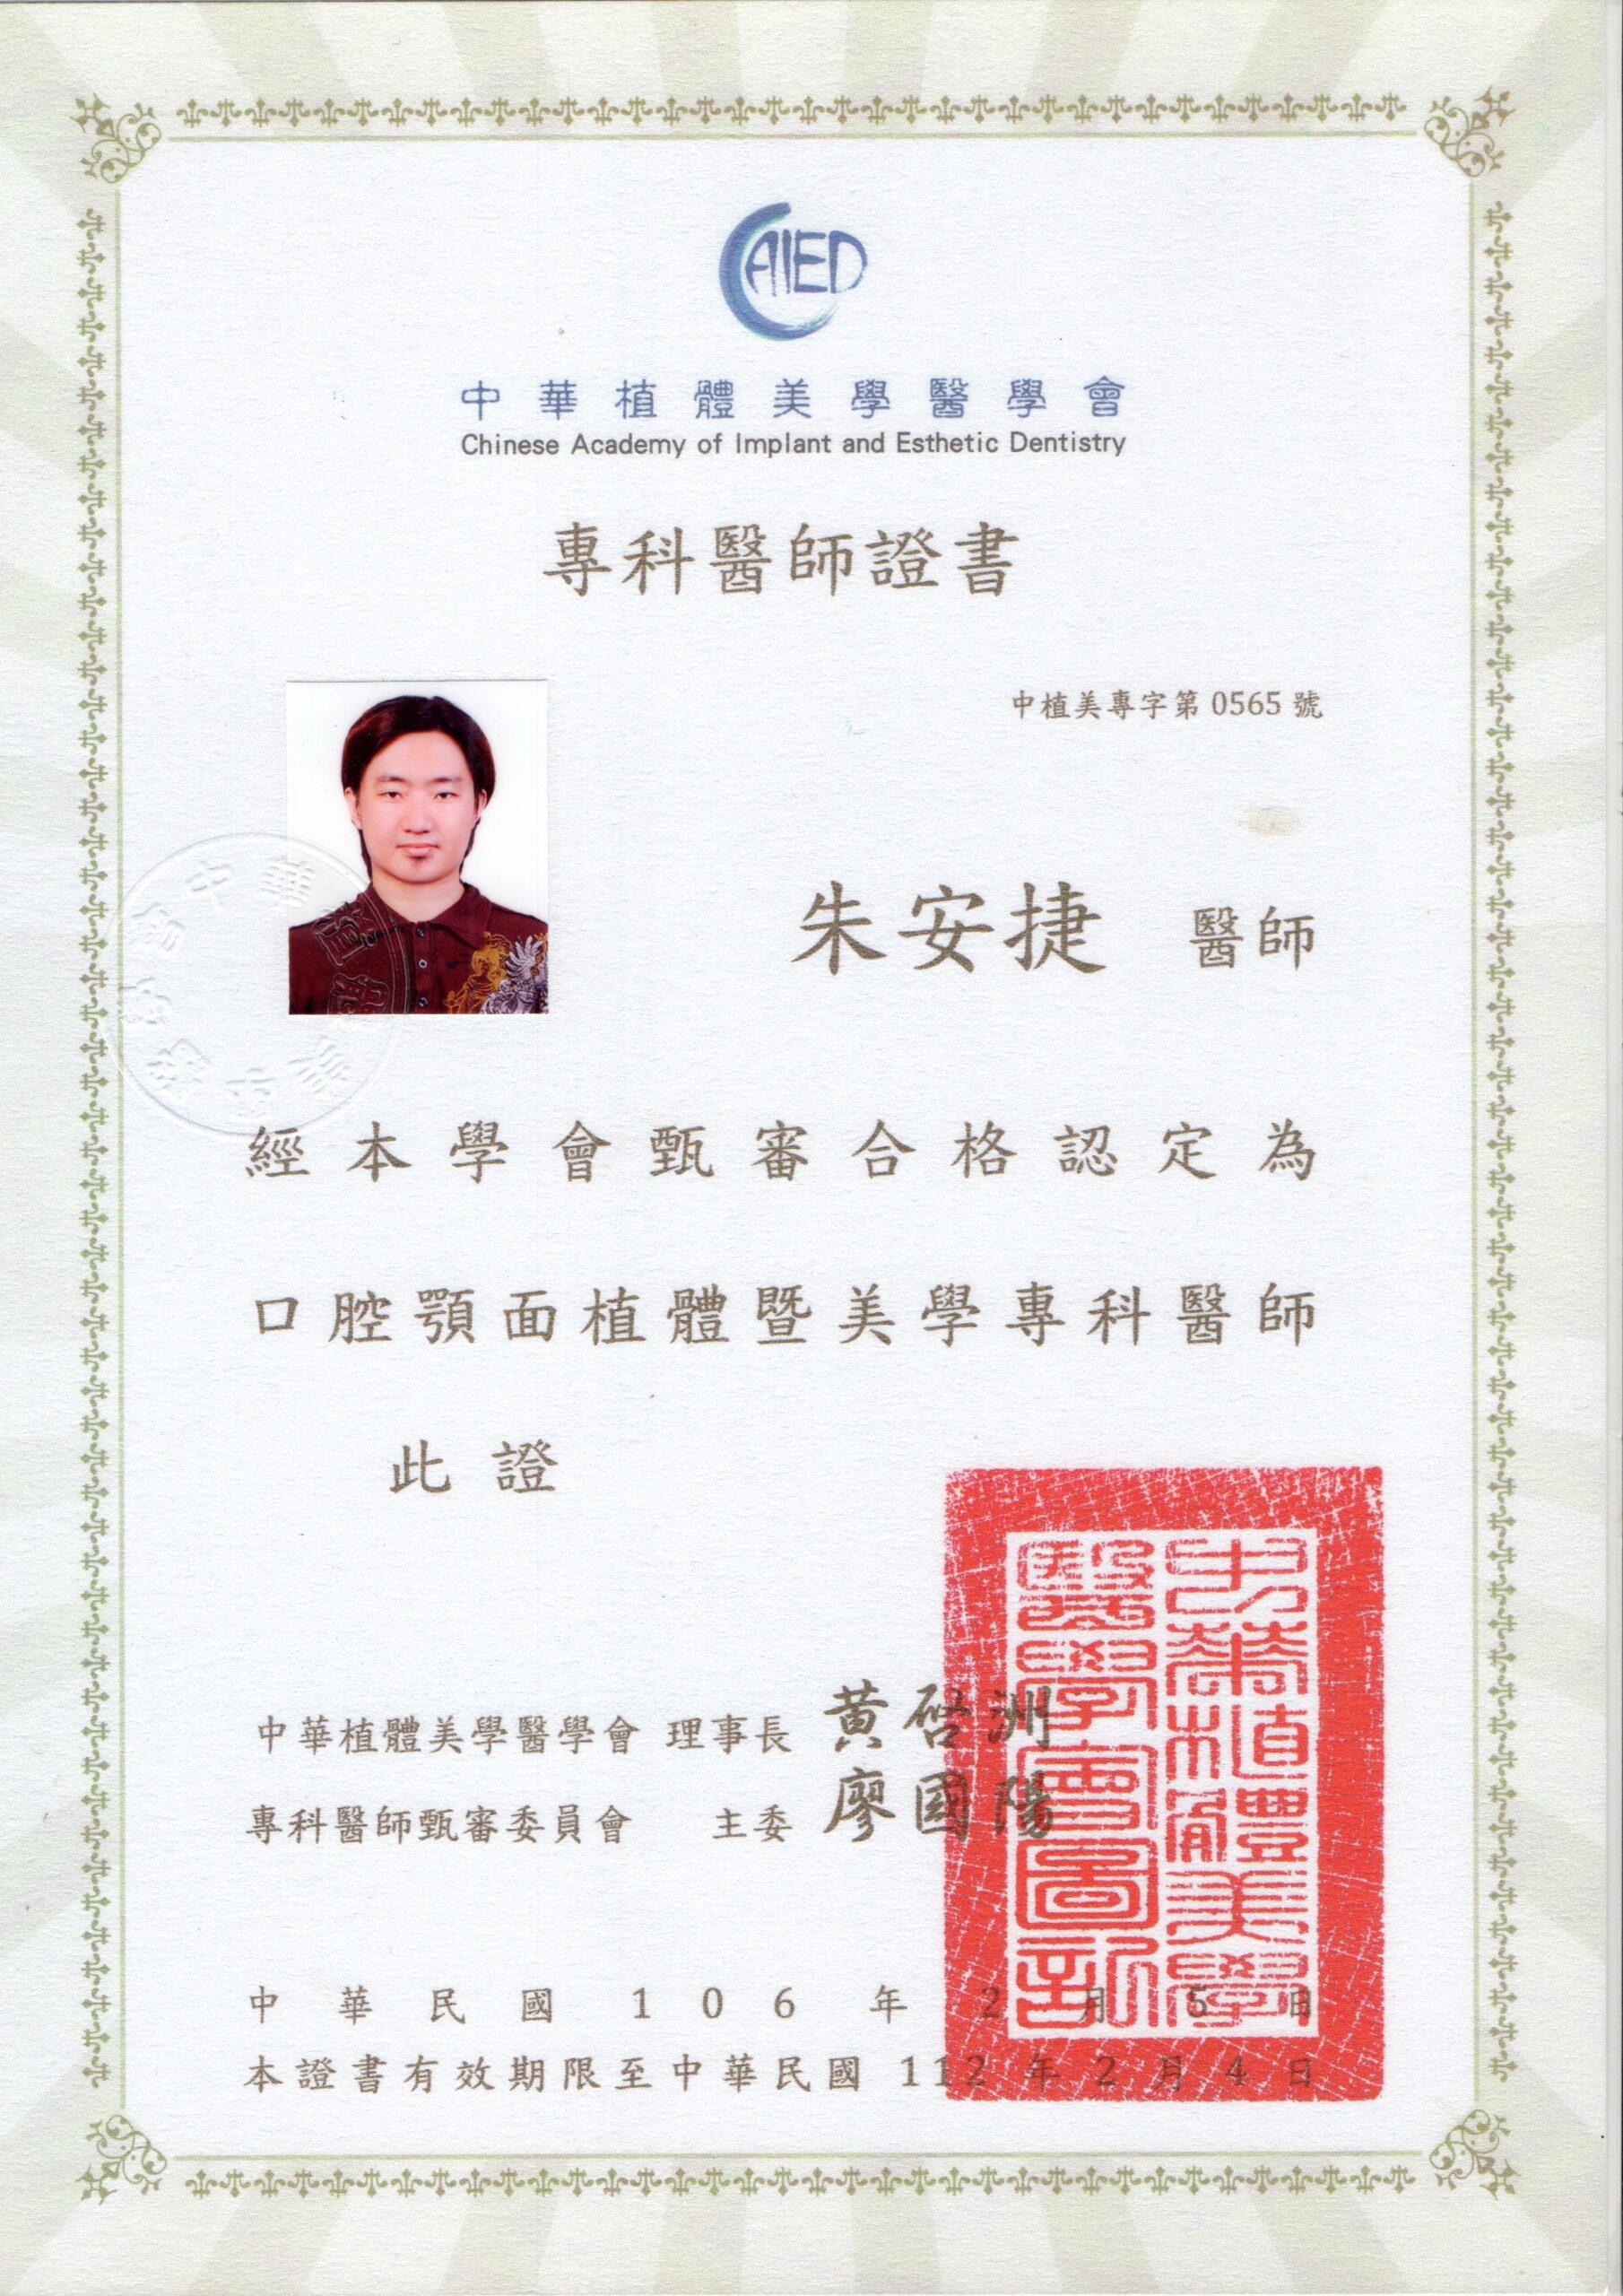 Dr朱-中華植體美學醫學會口腔顎面美學專科醫師